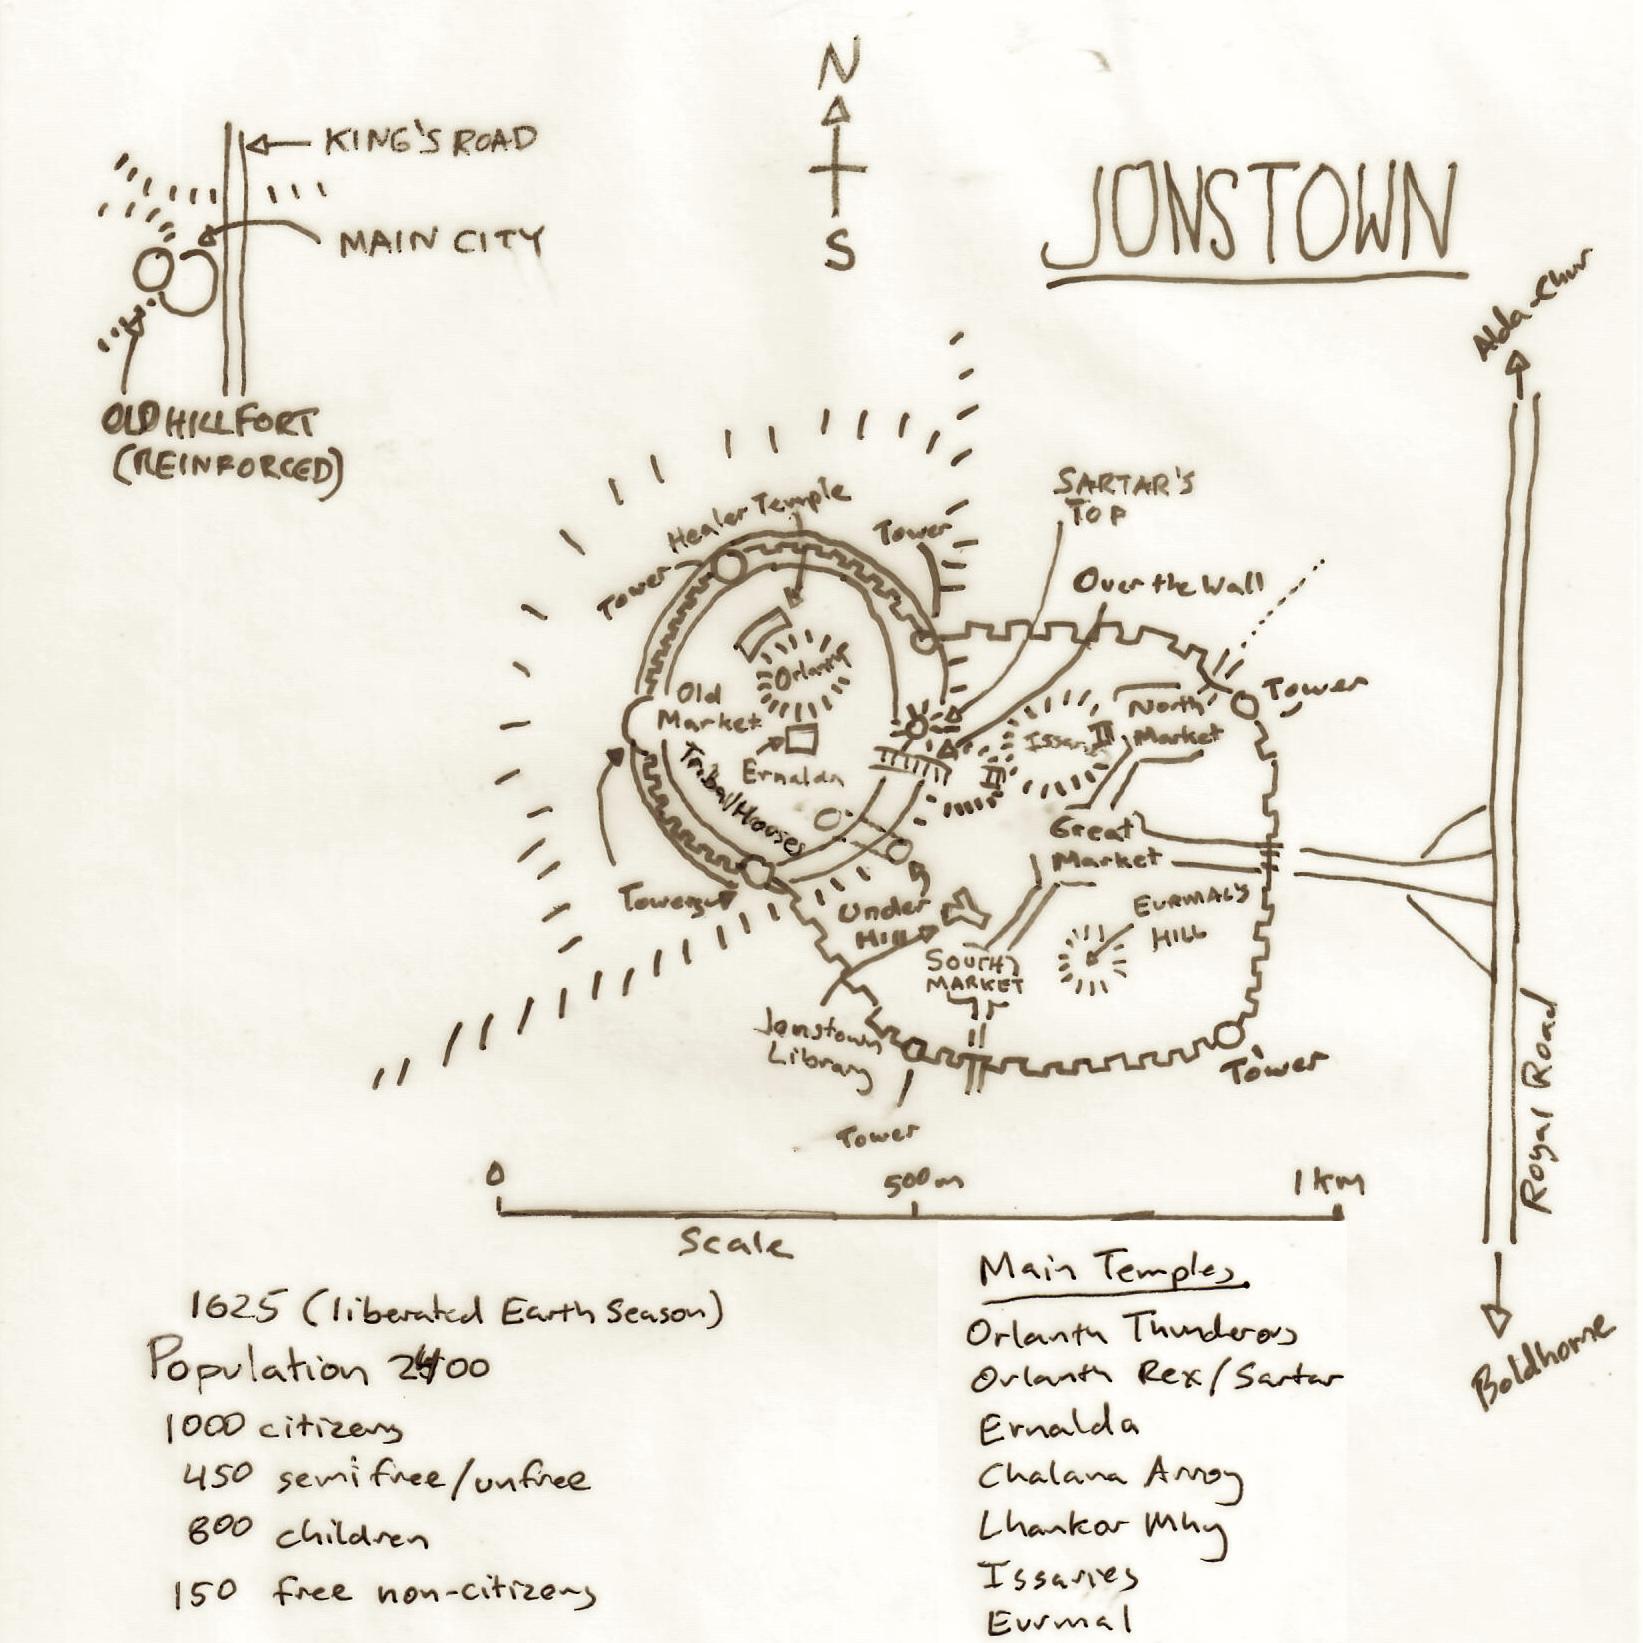 greg-stafford-s-map-of-jonstown.jpg